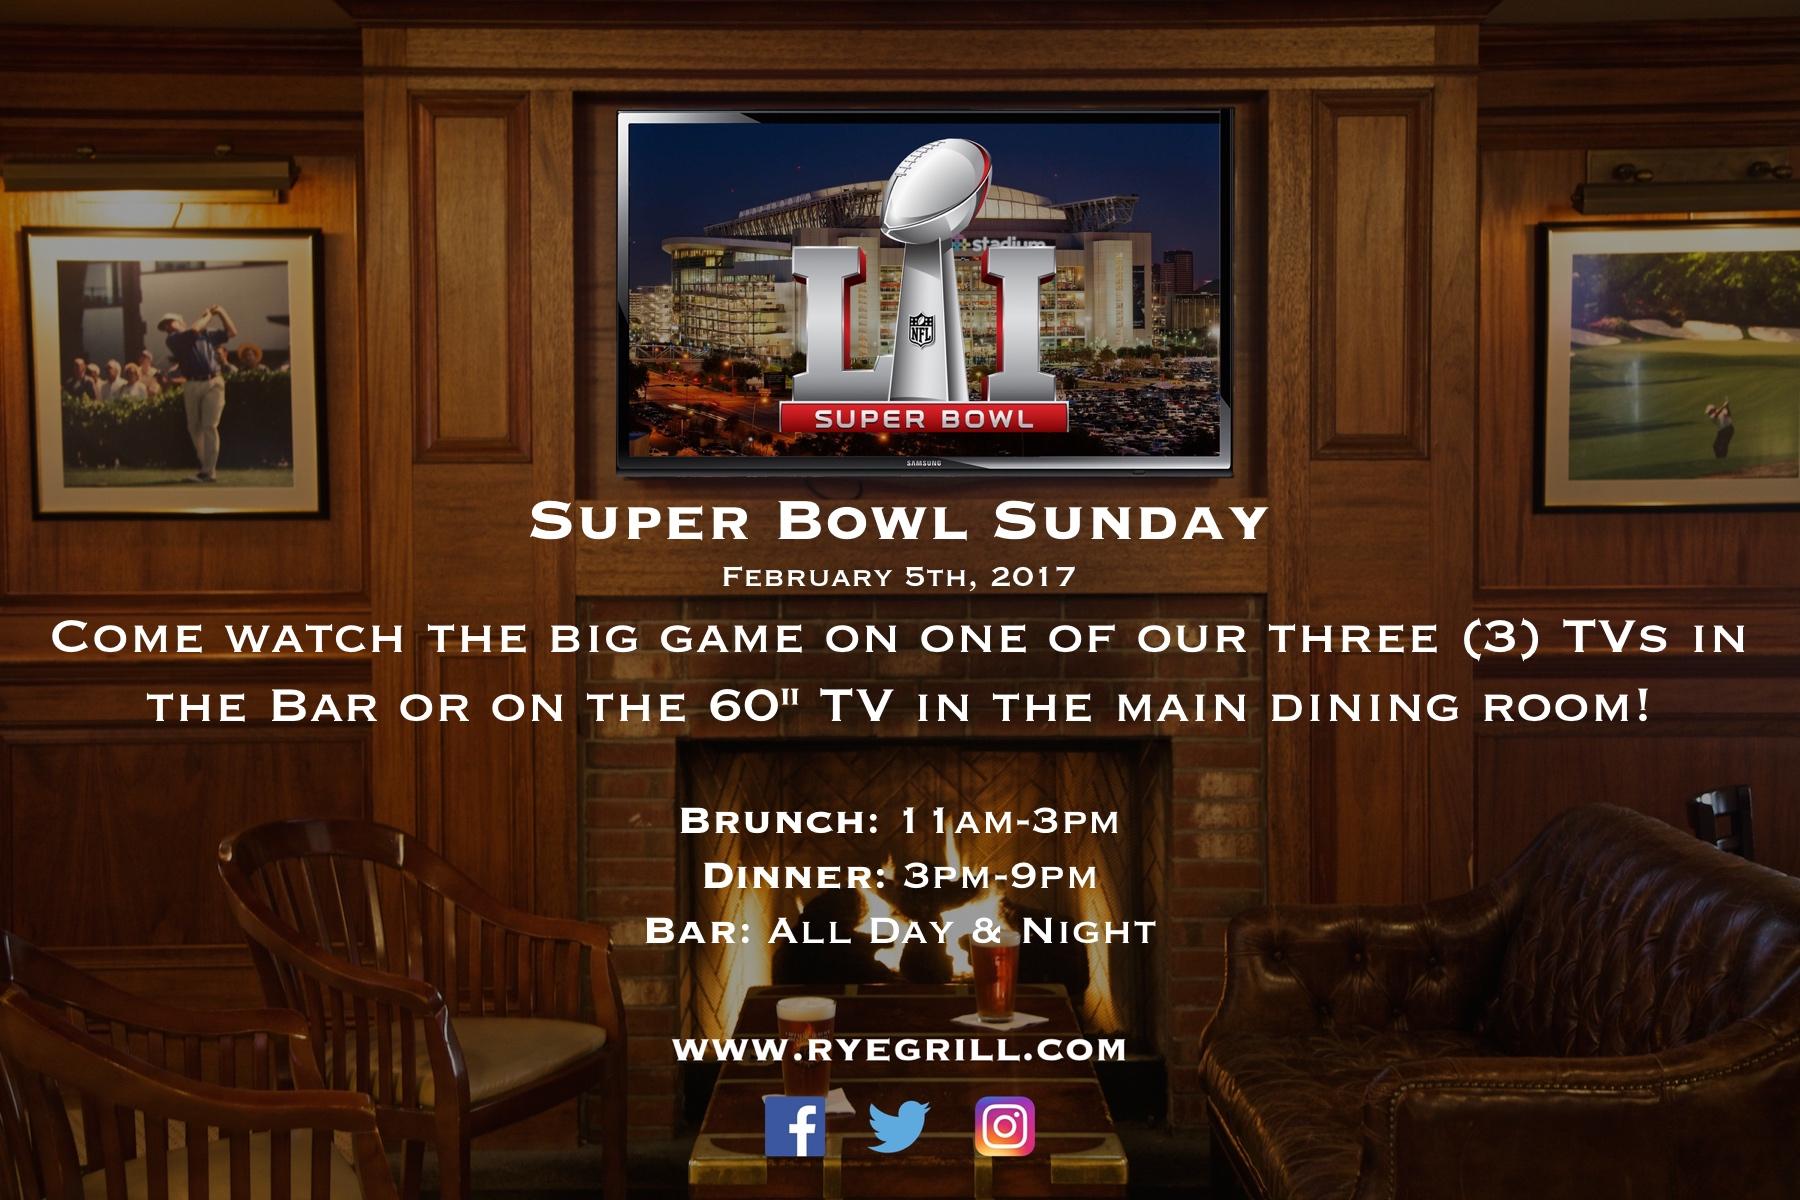 Rye Grill Super Bowl 1